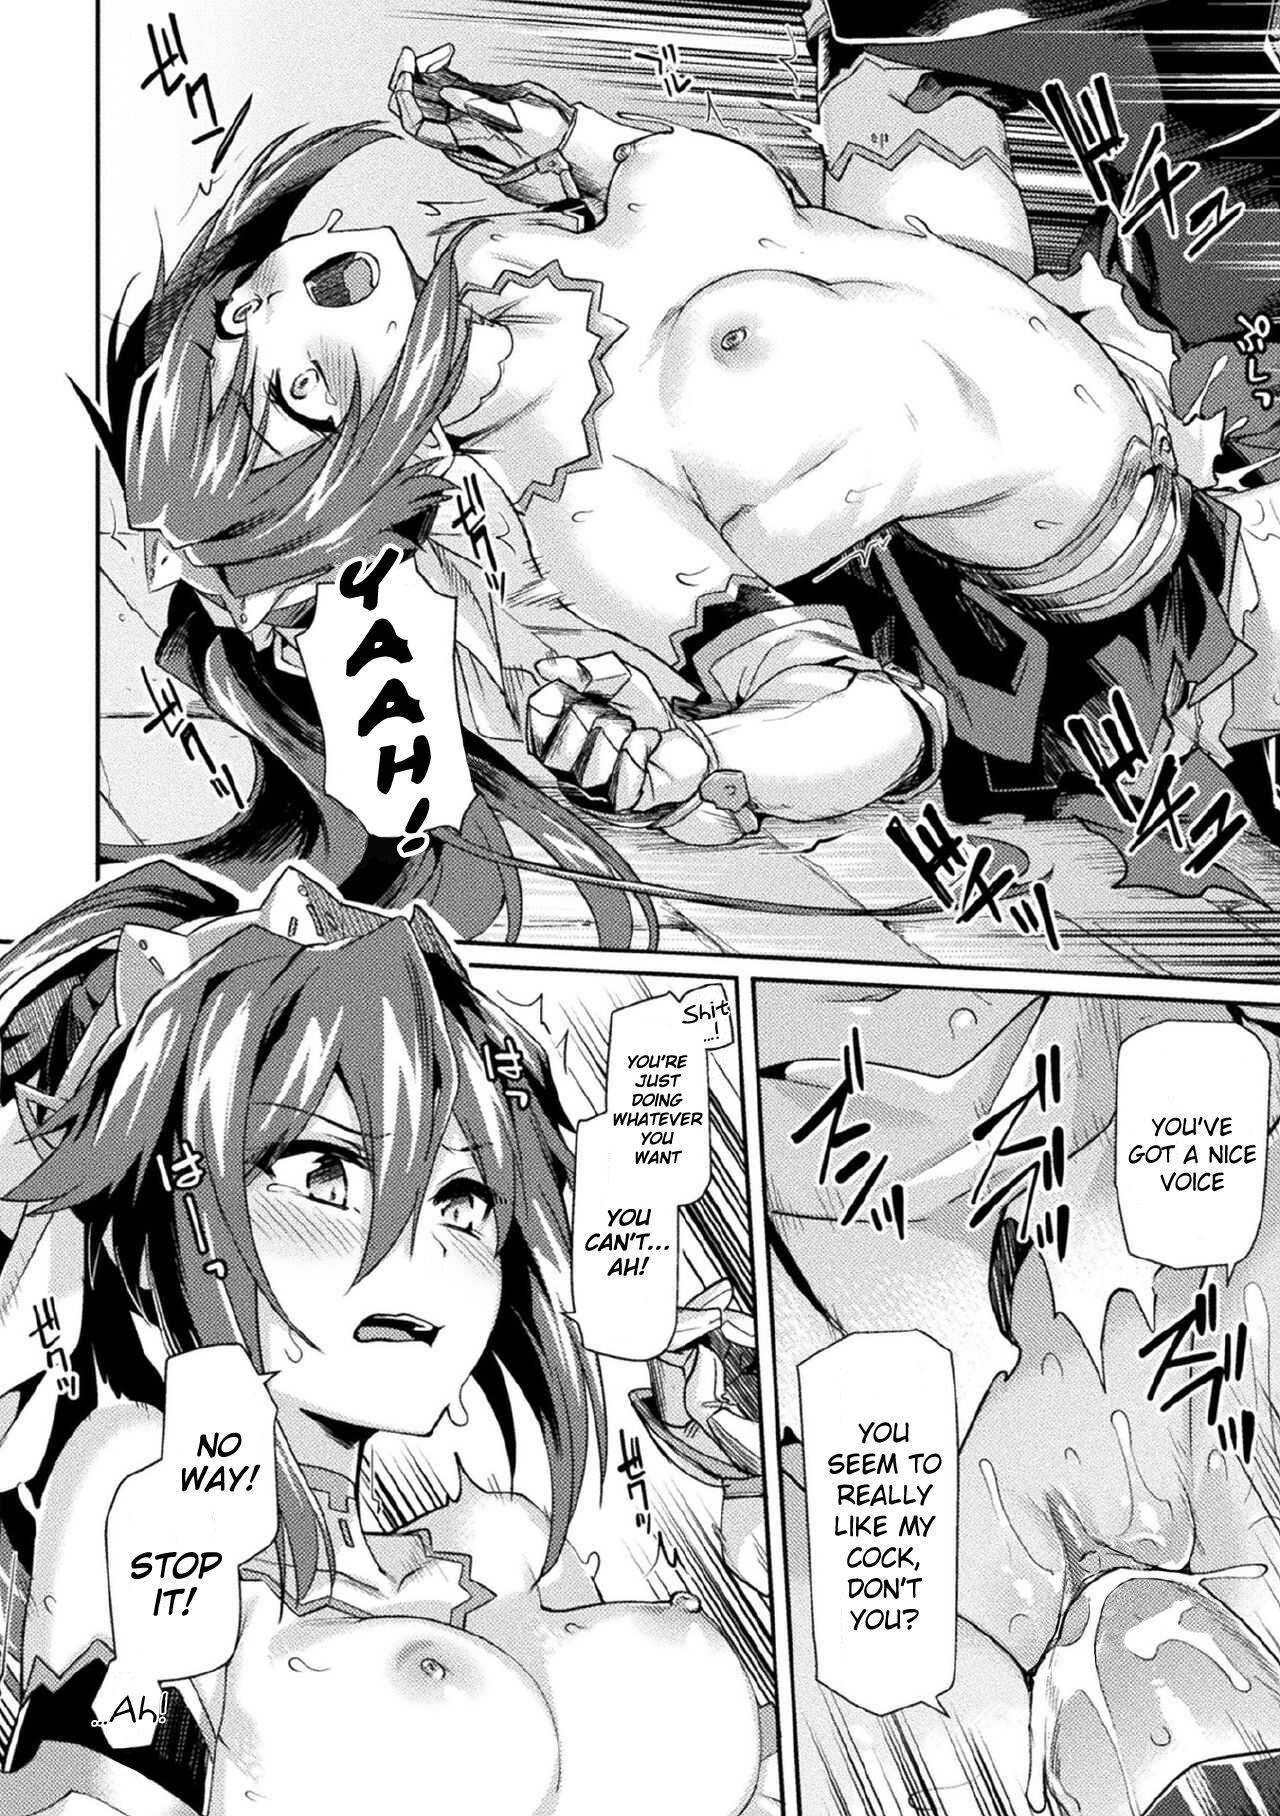 [Tsukitokage] Kuroinu II ~Inyoku ni Somaru Haitoku no Miyako, Futatabi~ THE COMIC Chapter 7 (Kukkoro Heroines Vol. 9) [English] [Decensored] (Klub Kemoner) [Digital] 9